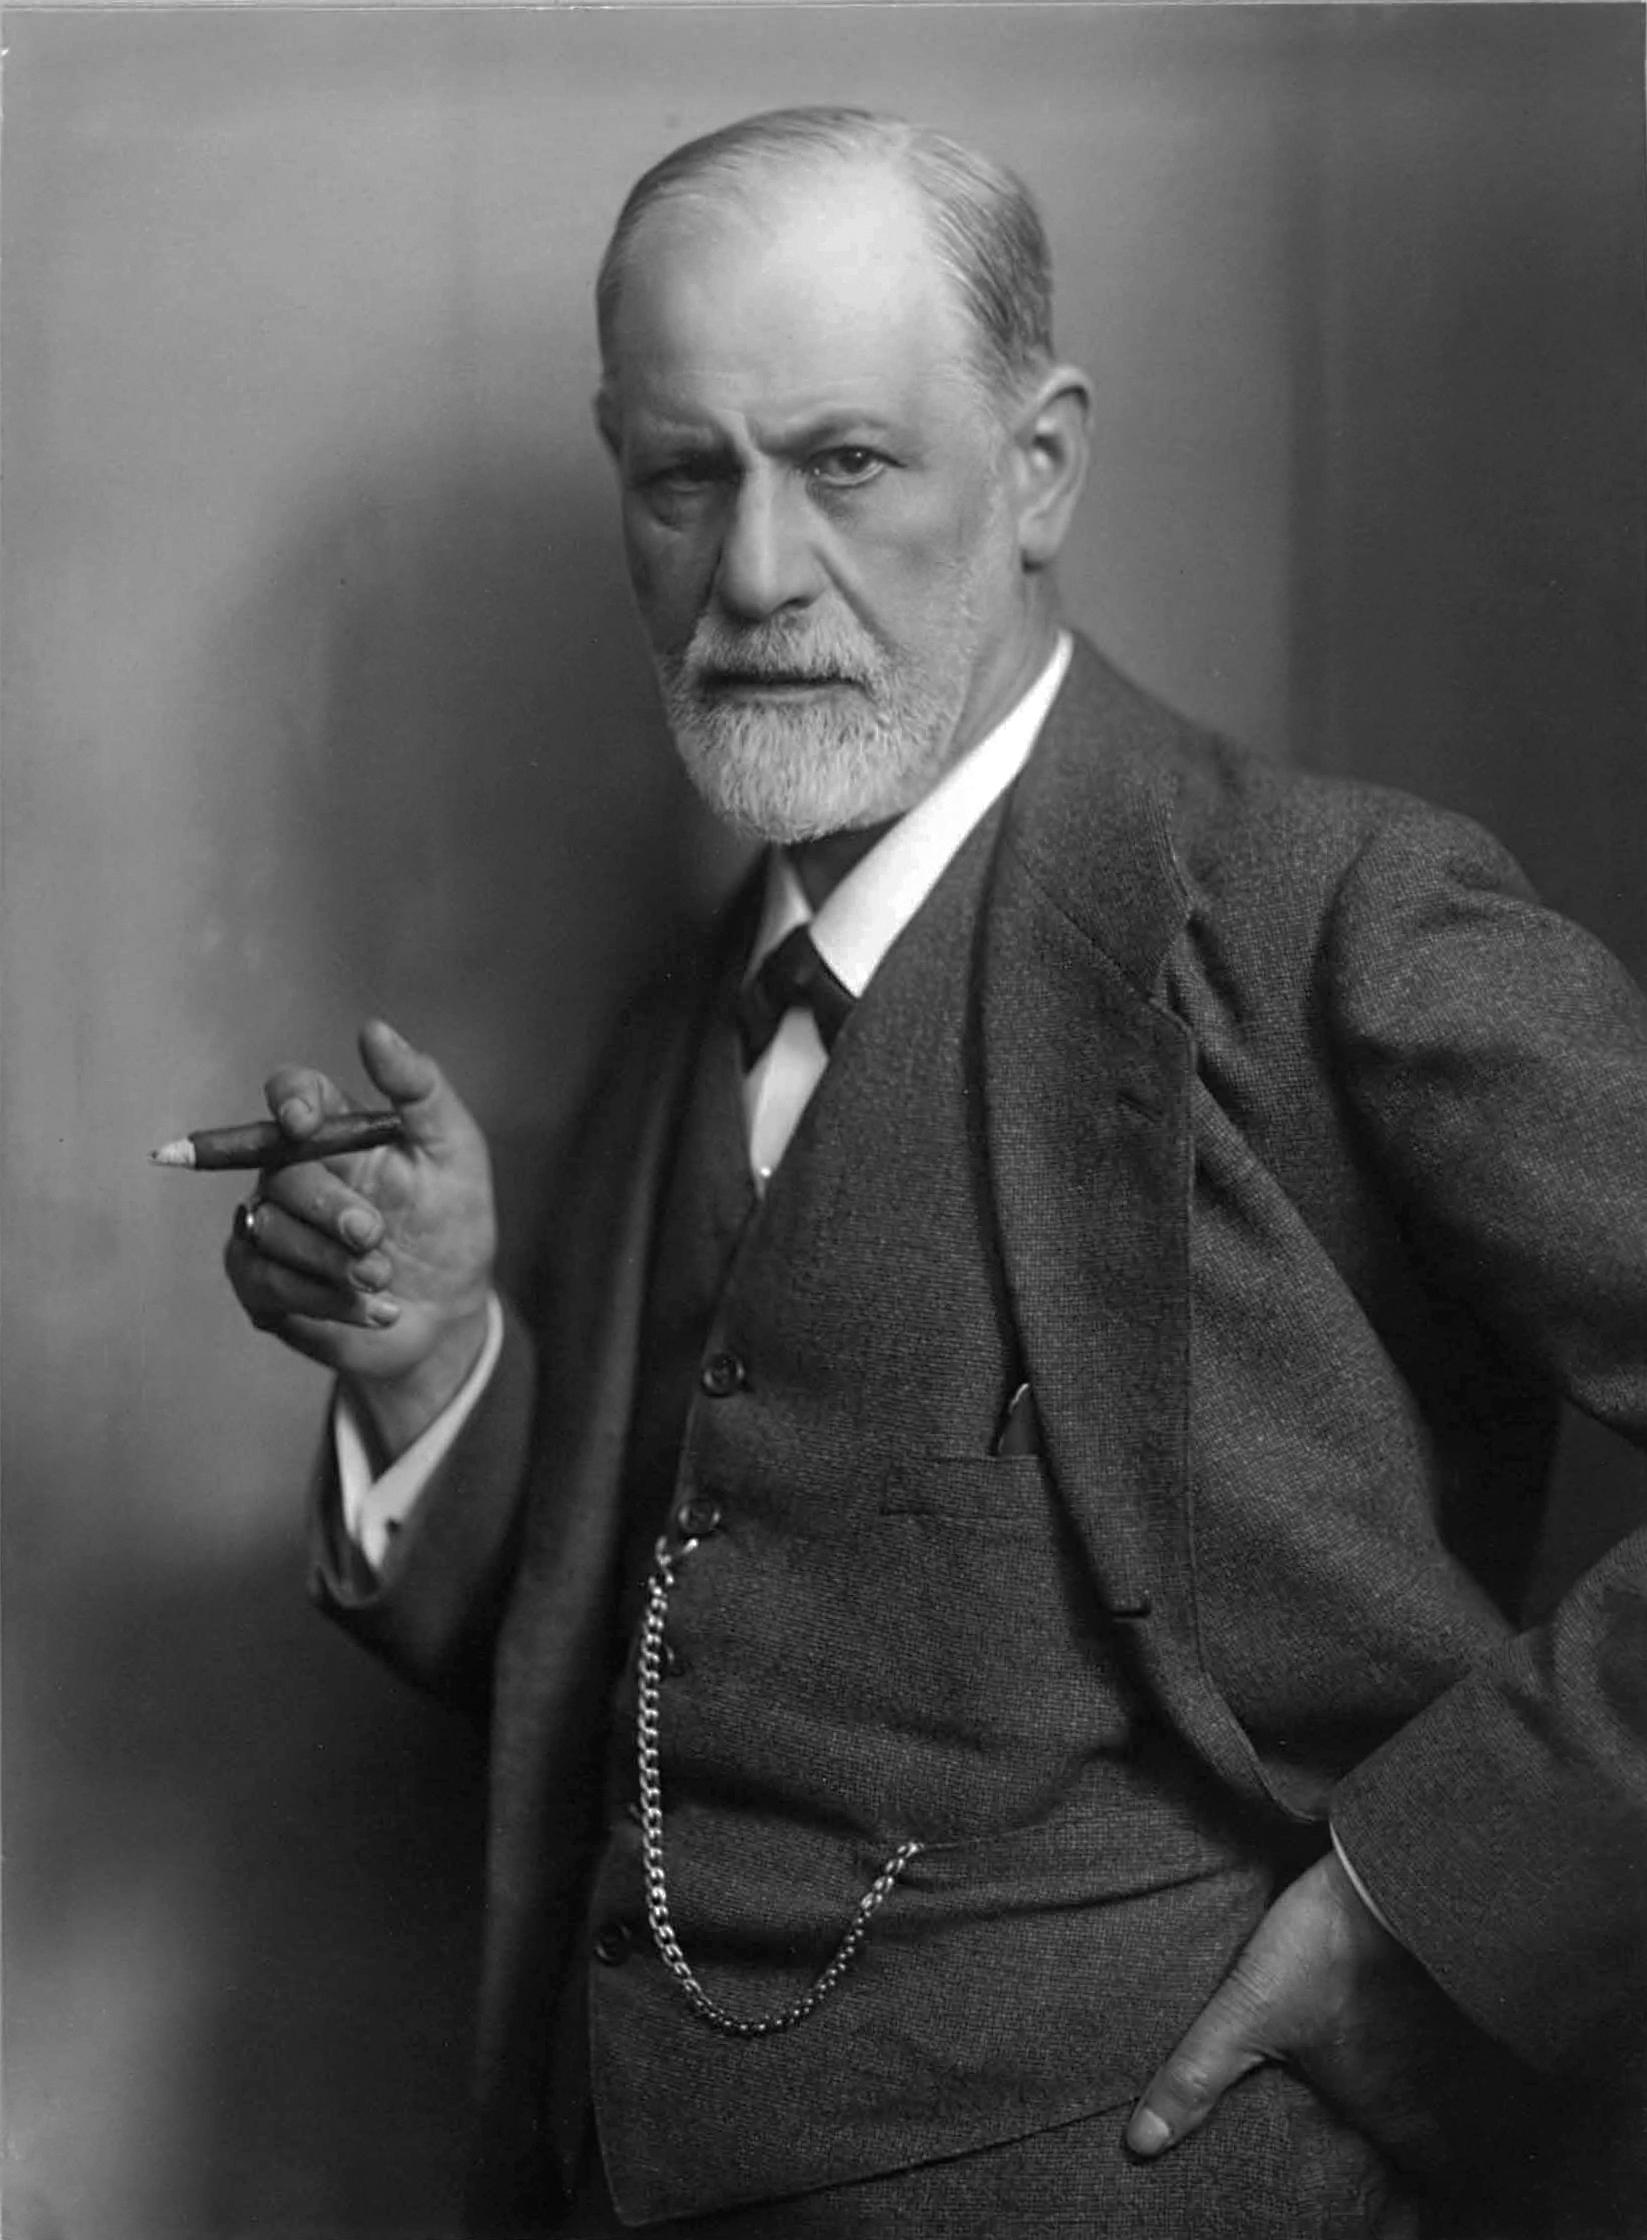 Portrait of Sigmund Freud, circa 1921. (Max Halberstadt, Wikimedia Commons)